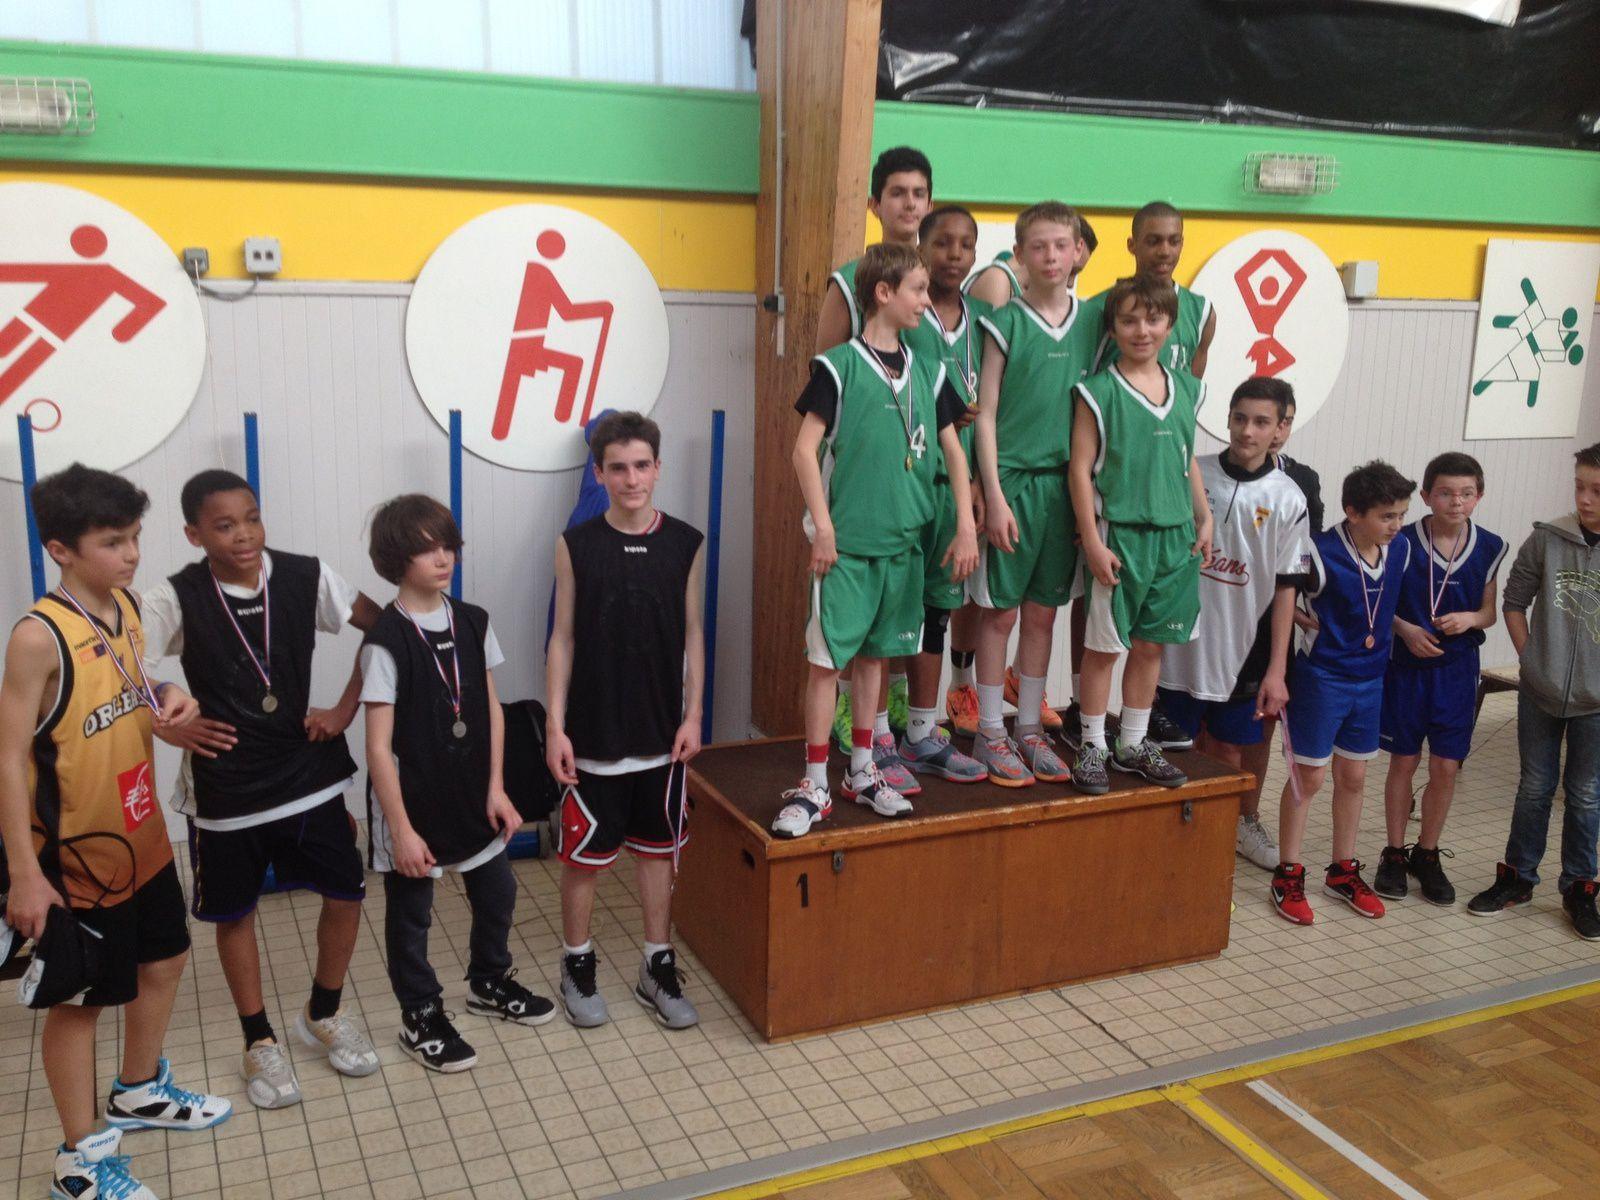 Les benjamines et les benjamins champions du Loiret en basket